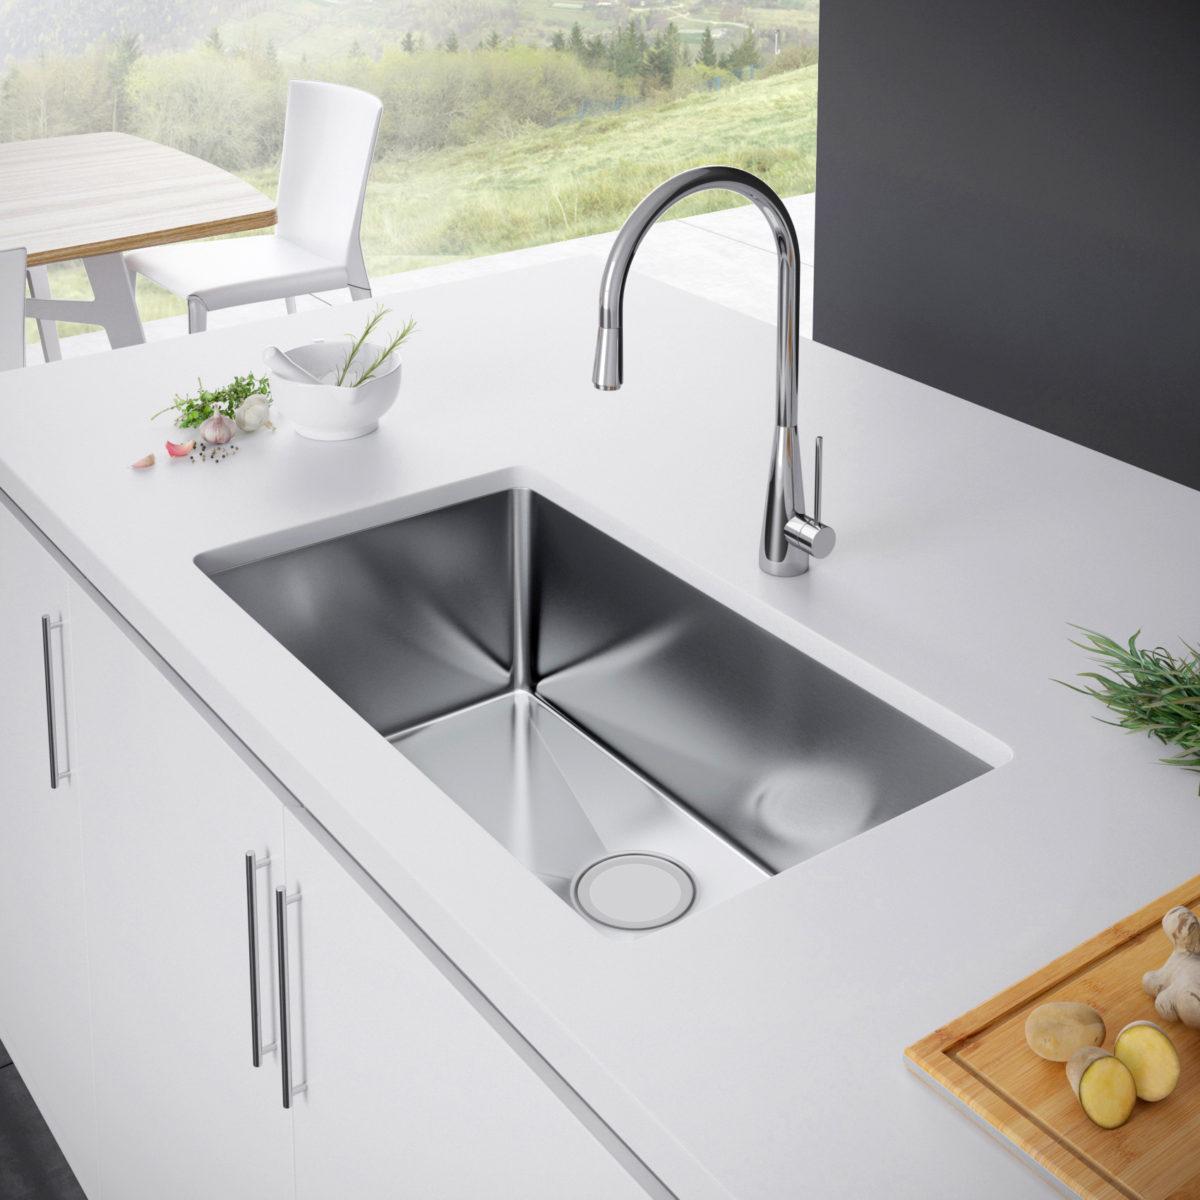 bathroom sinklaundry sink drop in sink corner sink small und